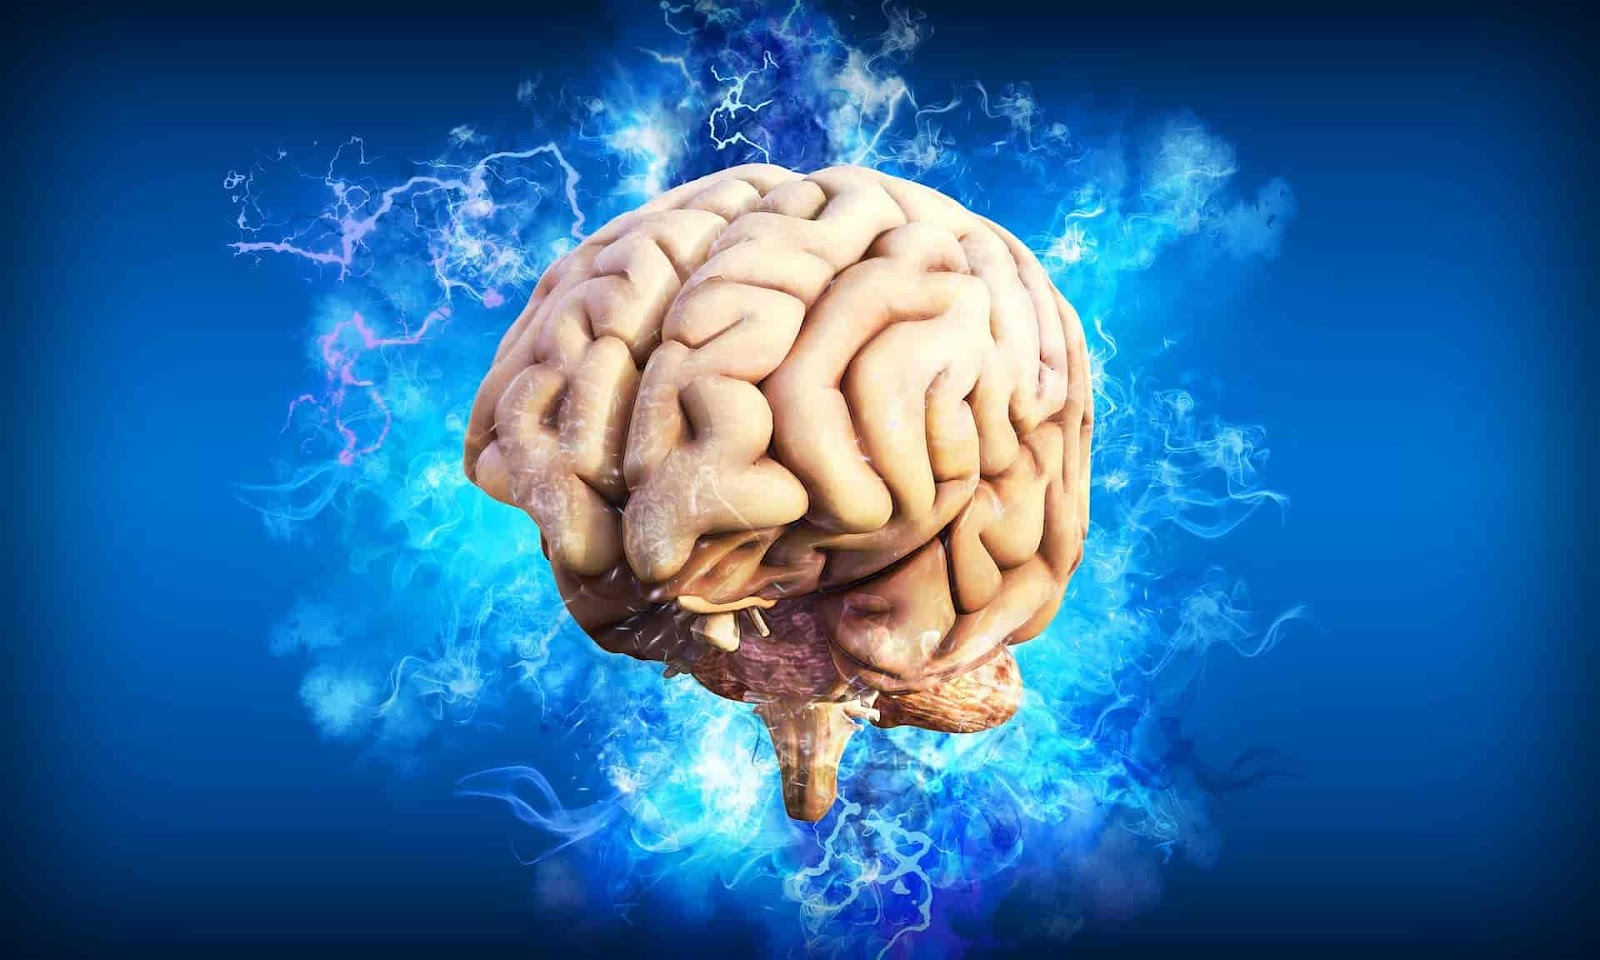 स्मरण शक्ति को ऐसे बढ़ाये | How to Increase You Memory Power and Intelligence